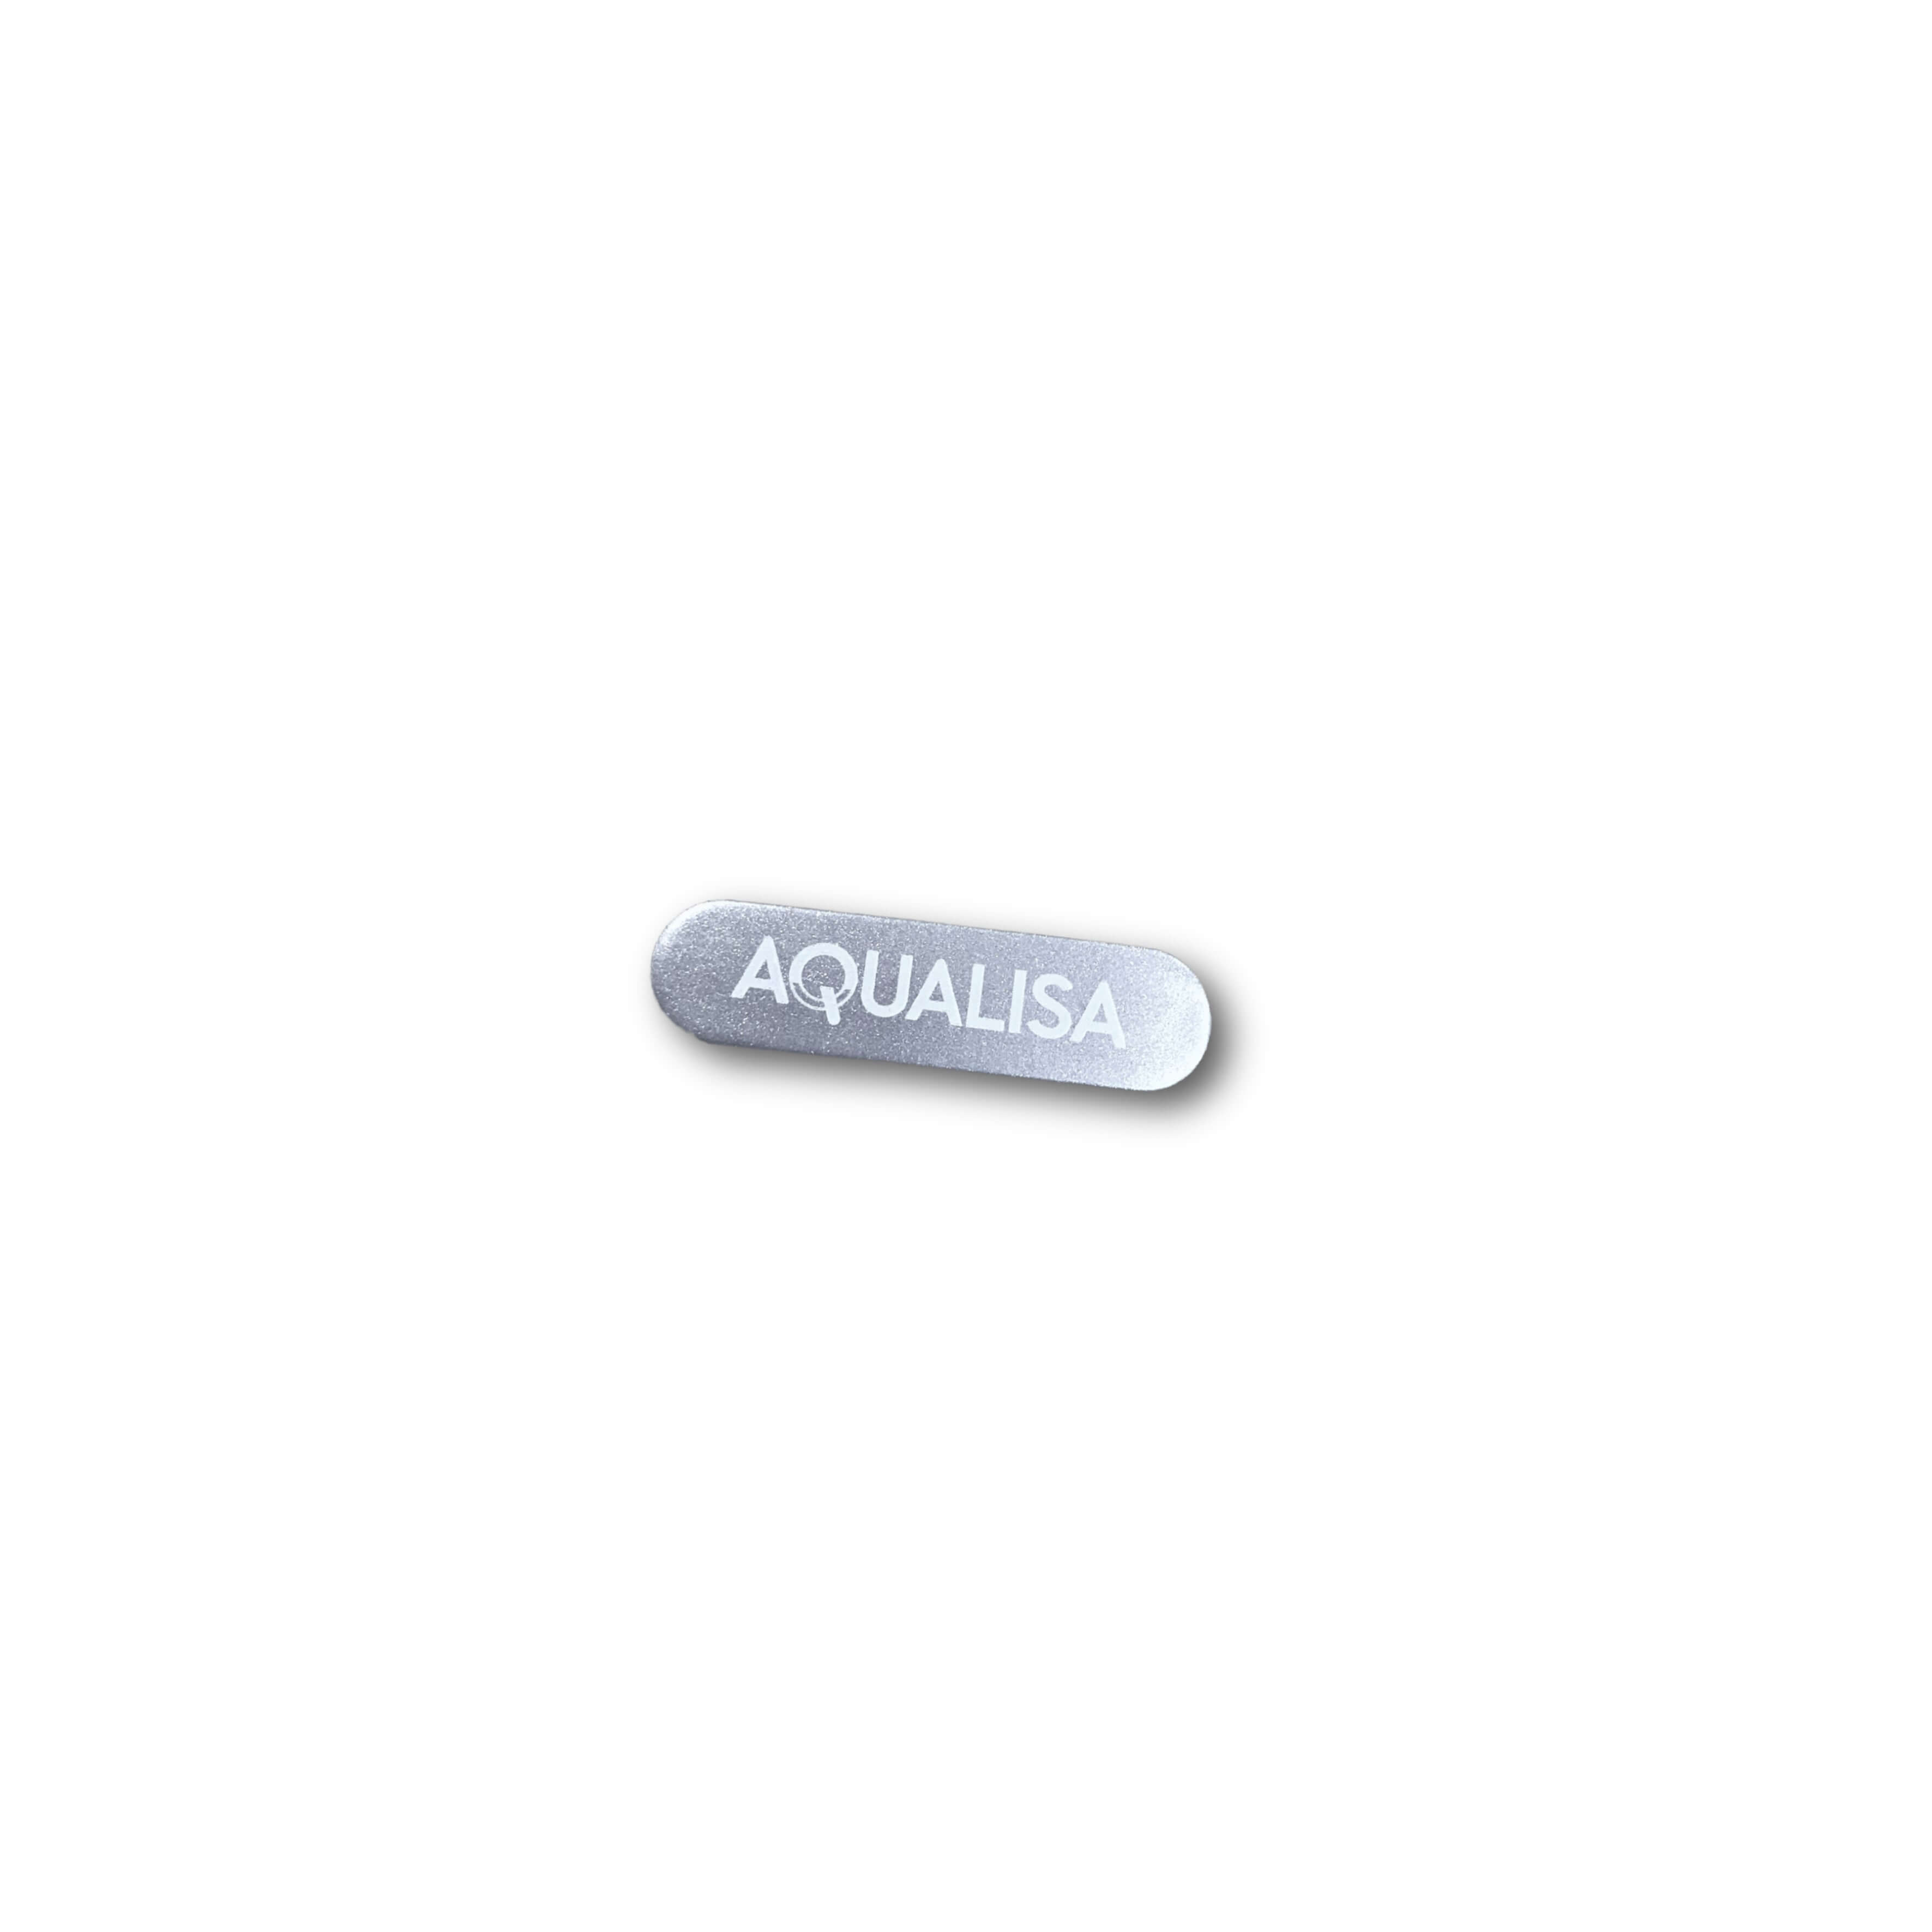 Aqualisa Badge 213037